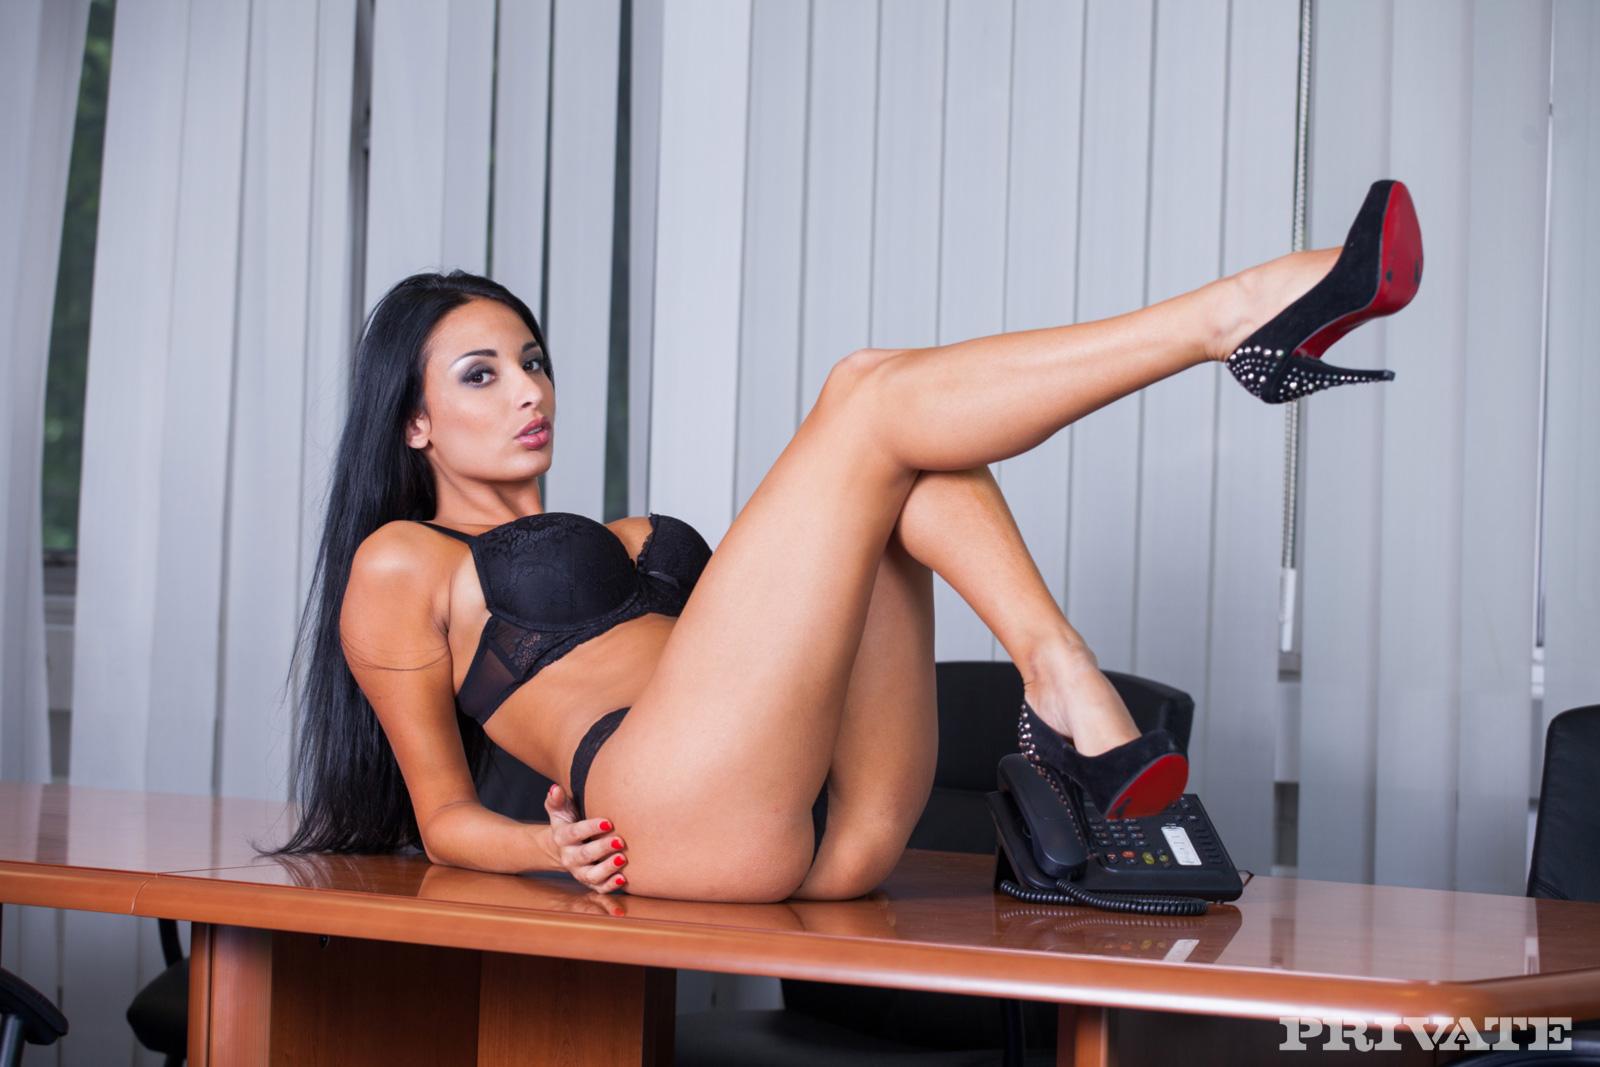 orgasm-slut-porn-free-latinas-big-butt-porn